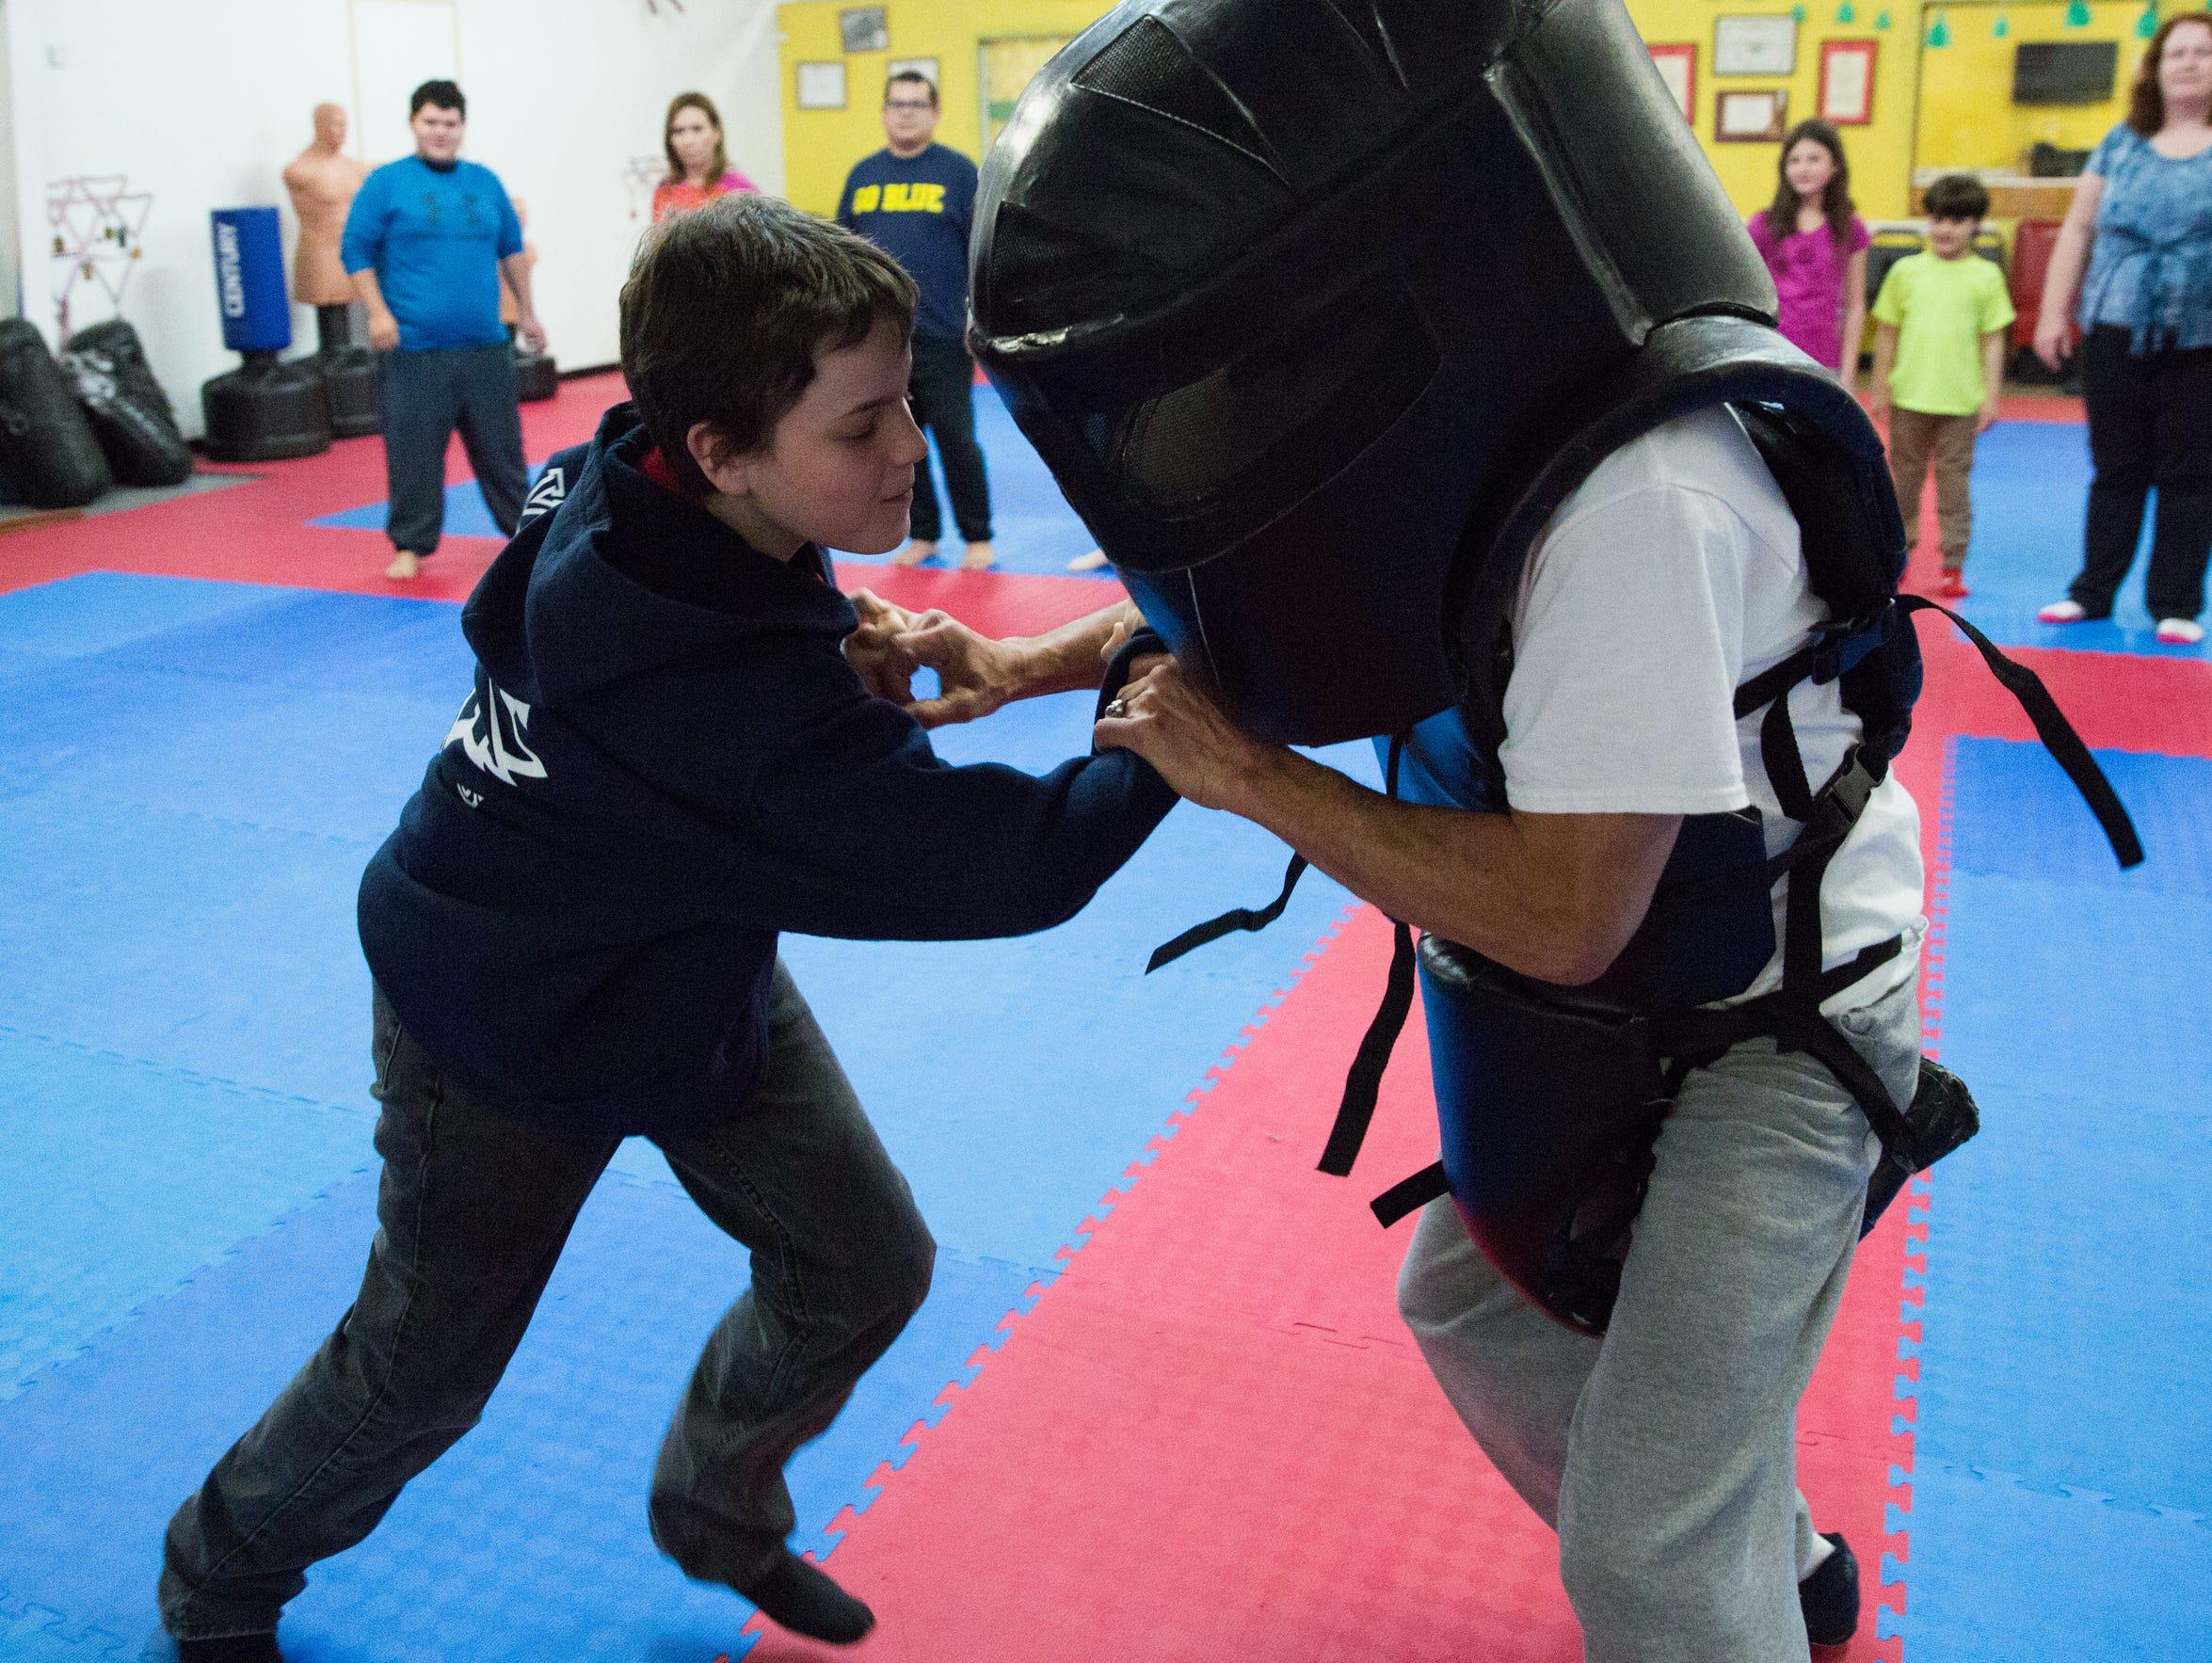 Zack Lackey, 13, practices self-defense techniques